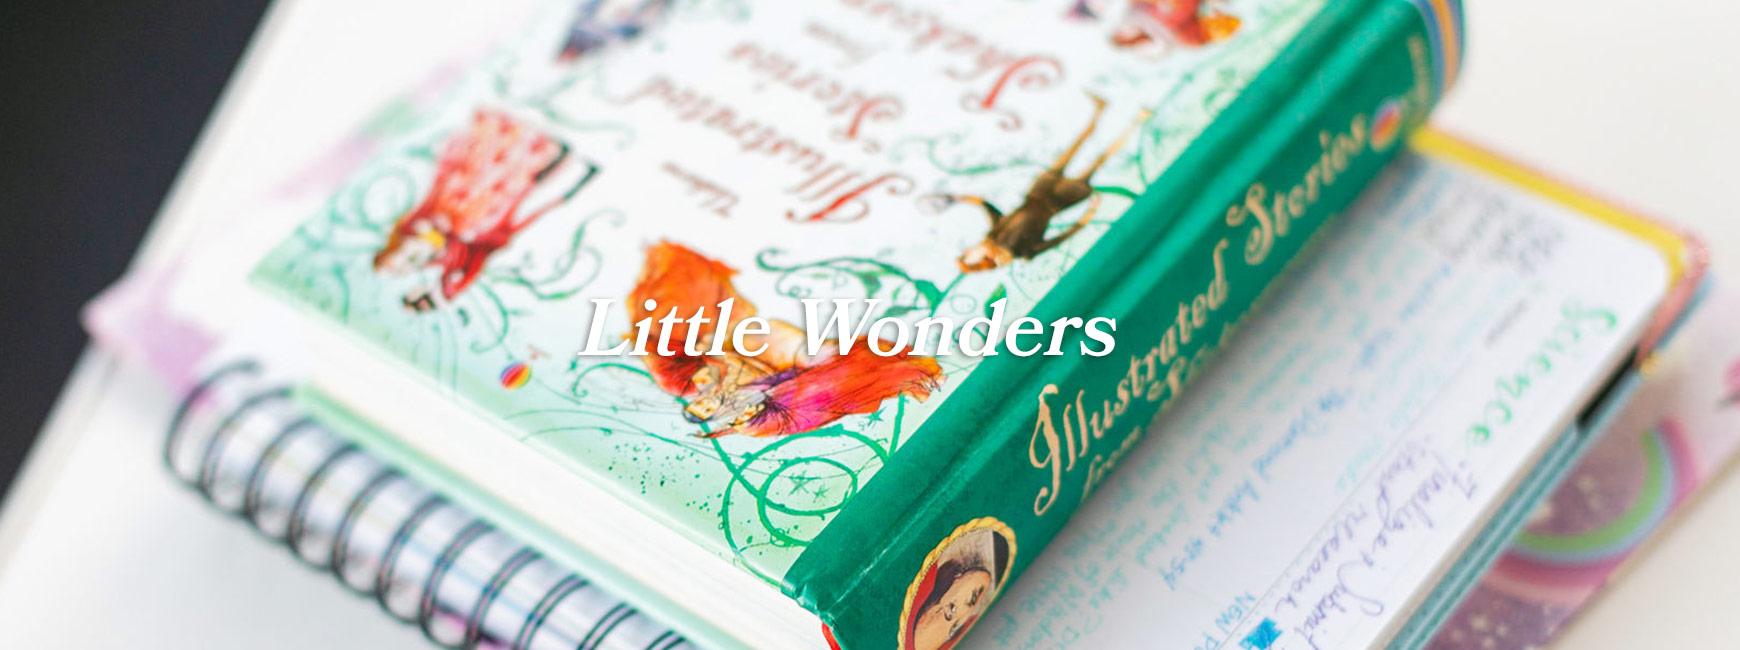 Little Wonders Literature